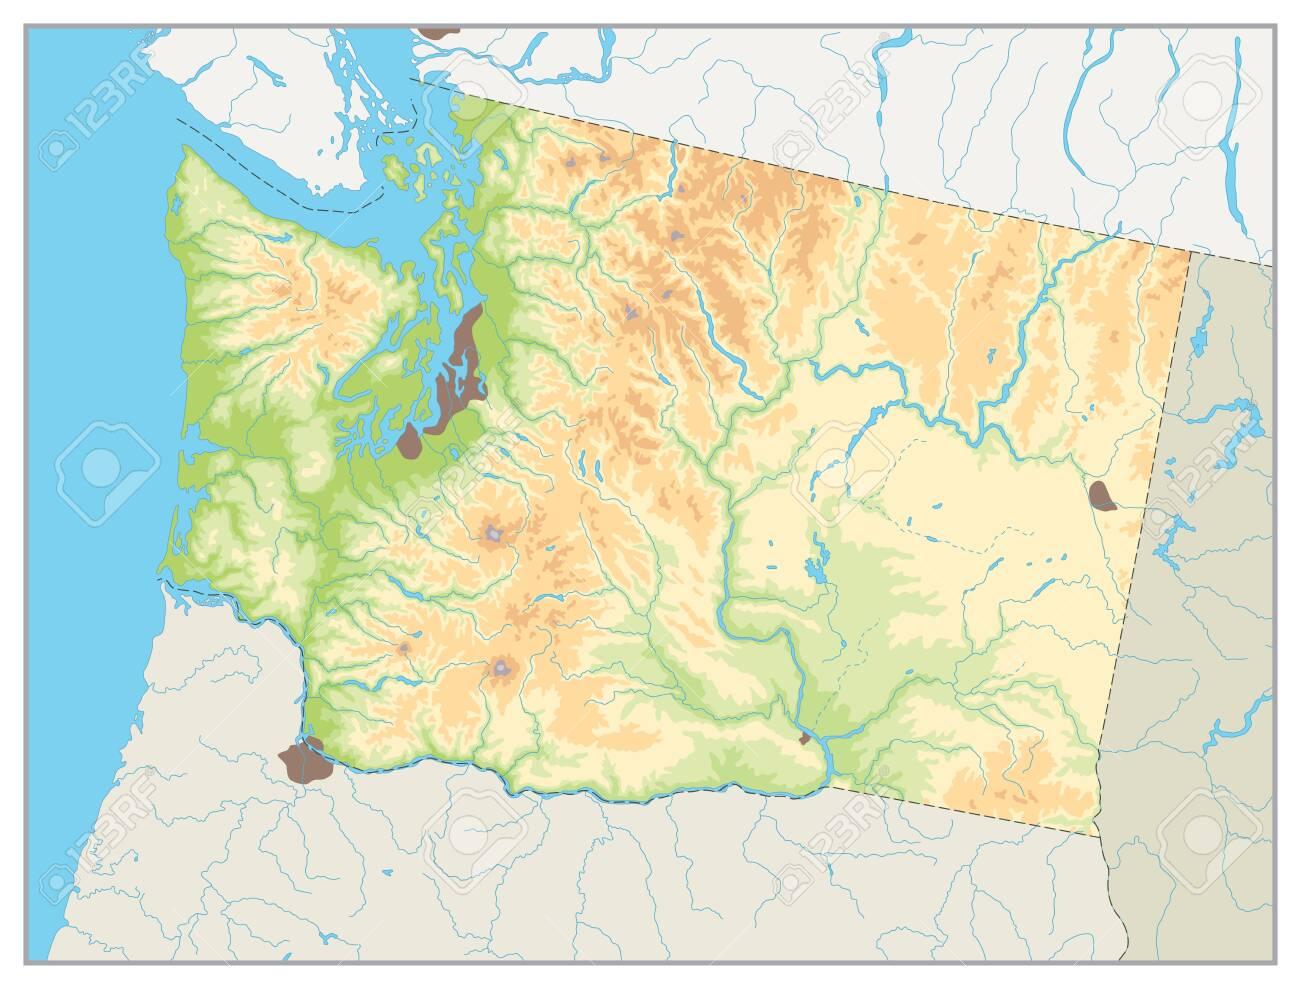 Picture of: Physical Map Of Washington State A Main Relief Rivers Lakes And Highways No Text Ilustraciones Vectoriales Clip Art Vectorizado Libre De Derechos Image 145745726